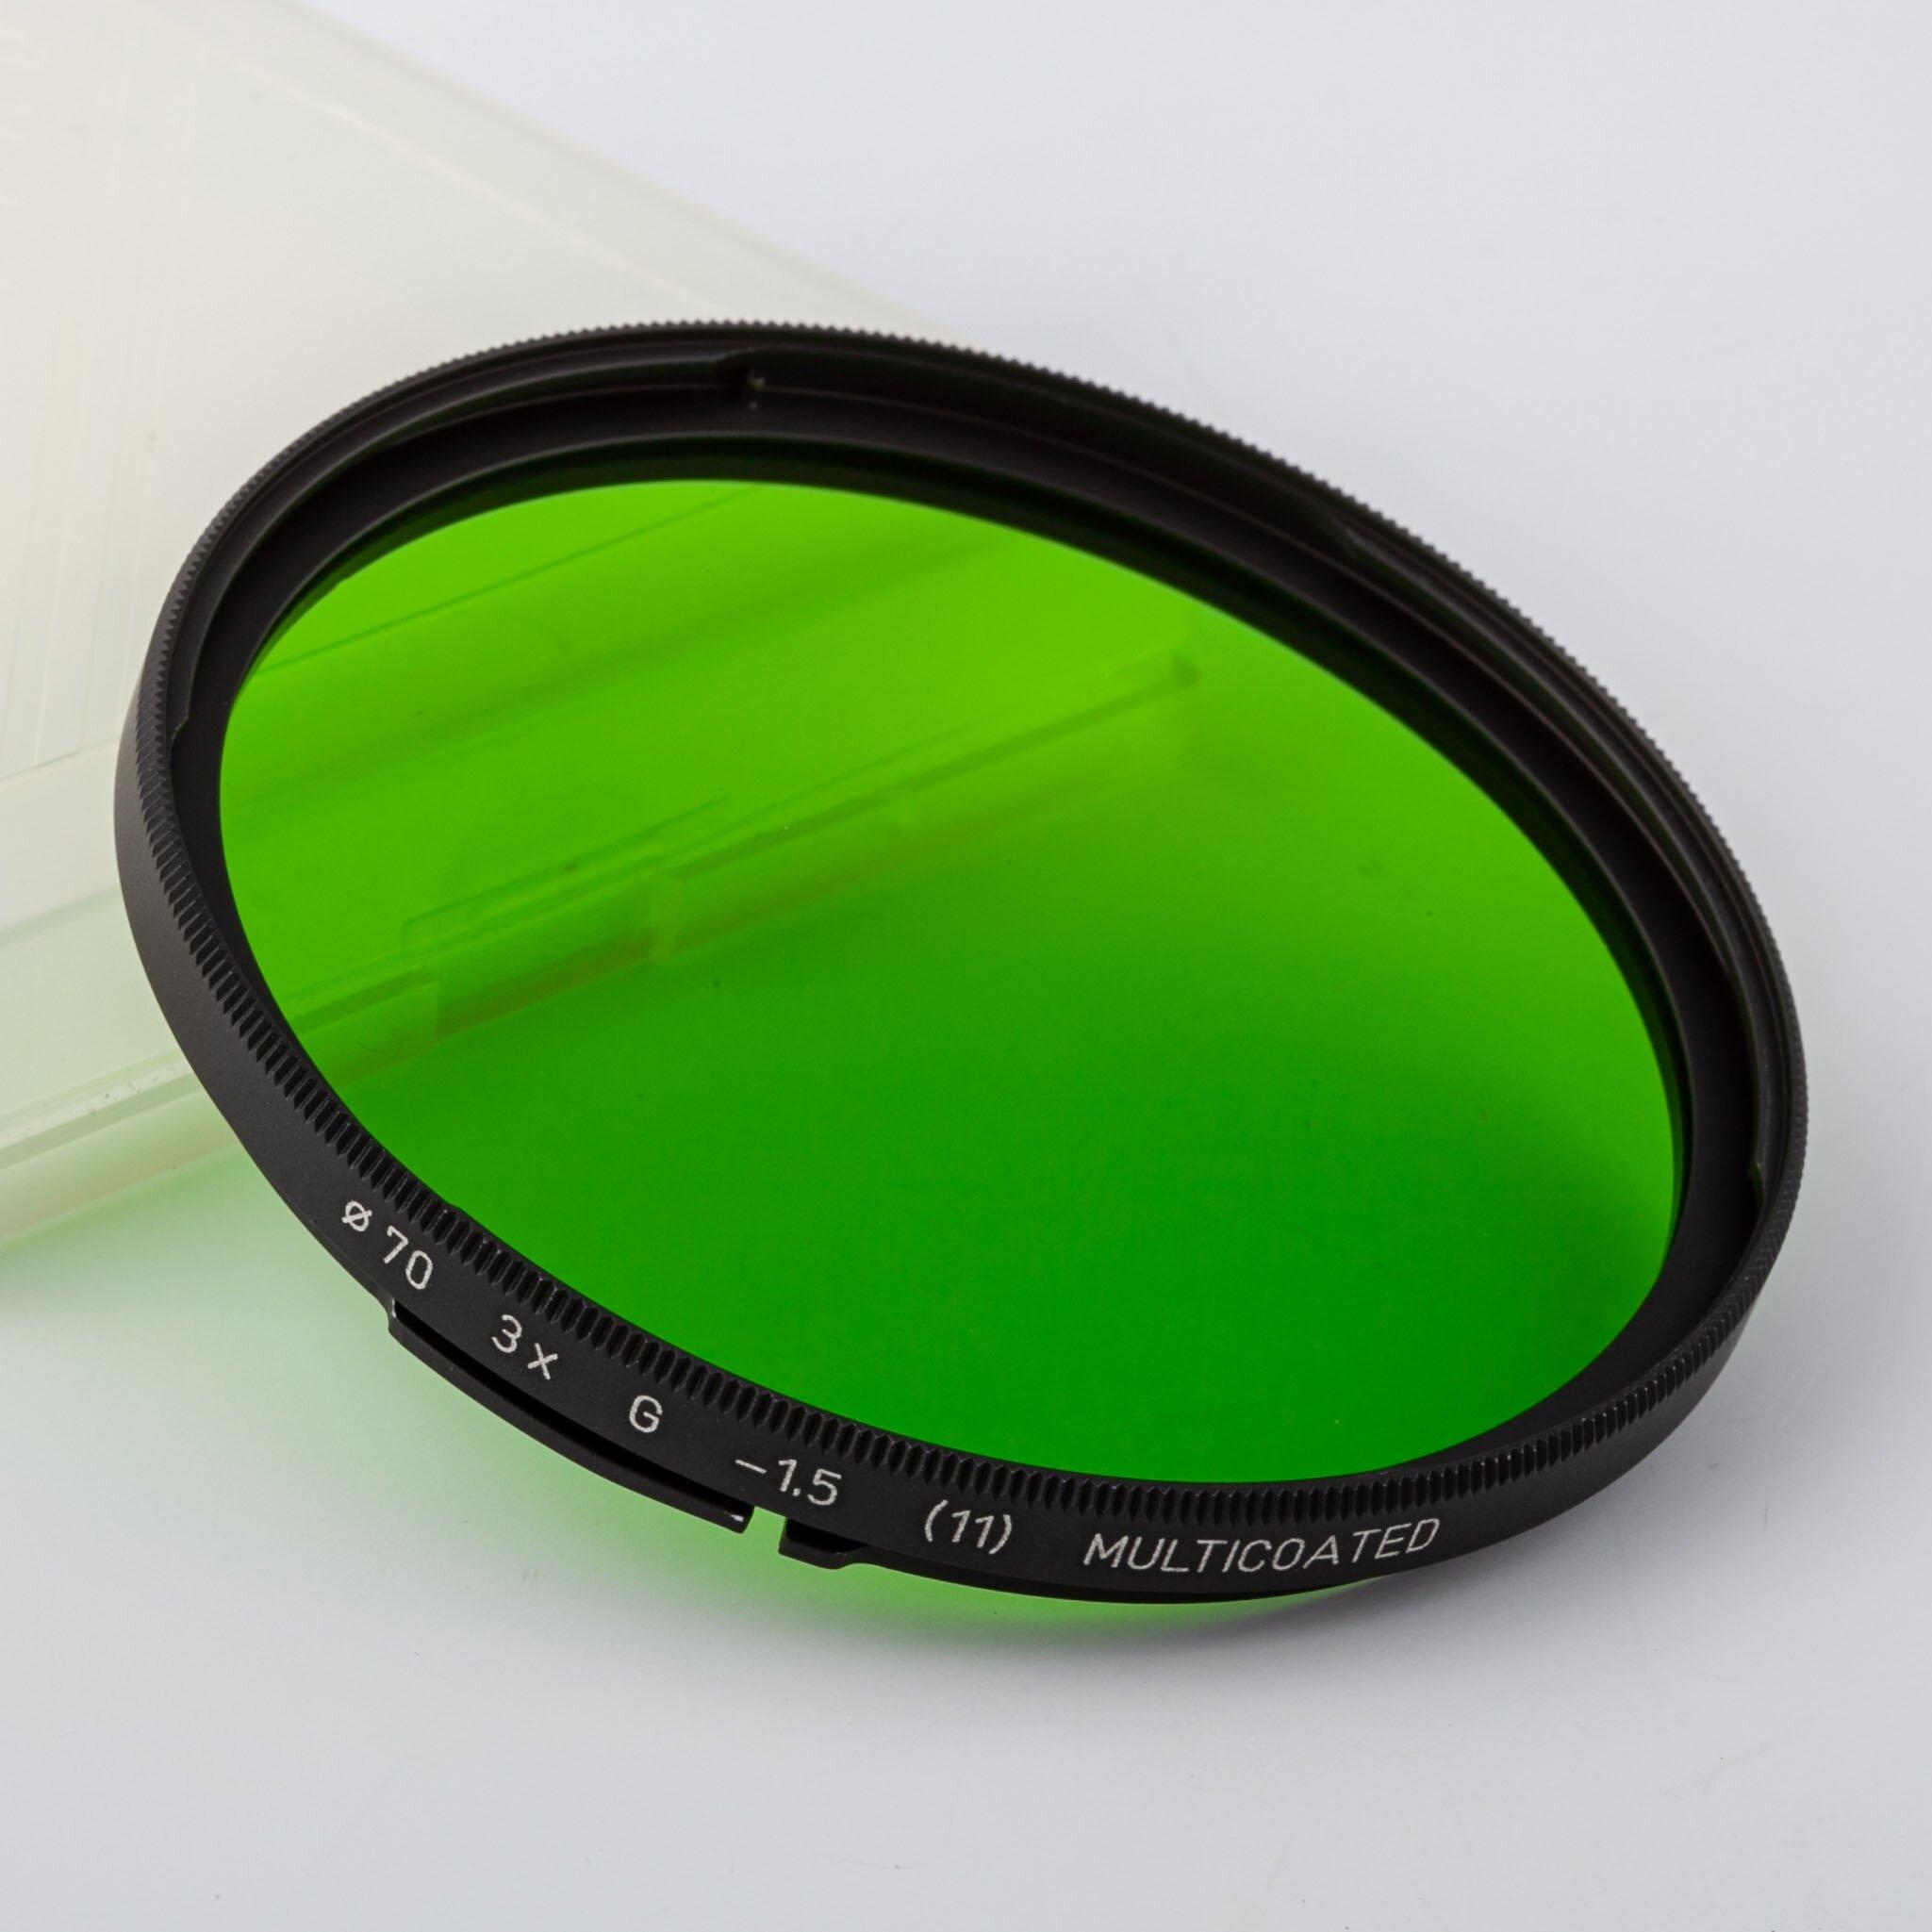 Hasselblad B70 3x G -1,5 (11) Multicoated grün